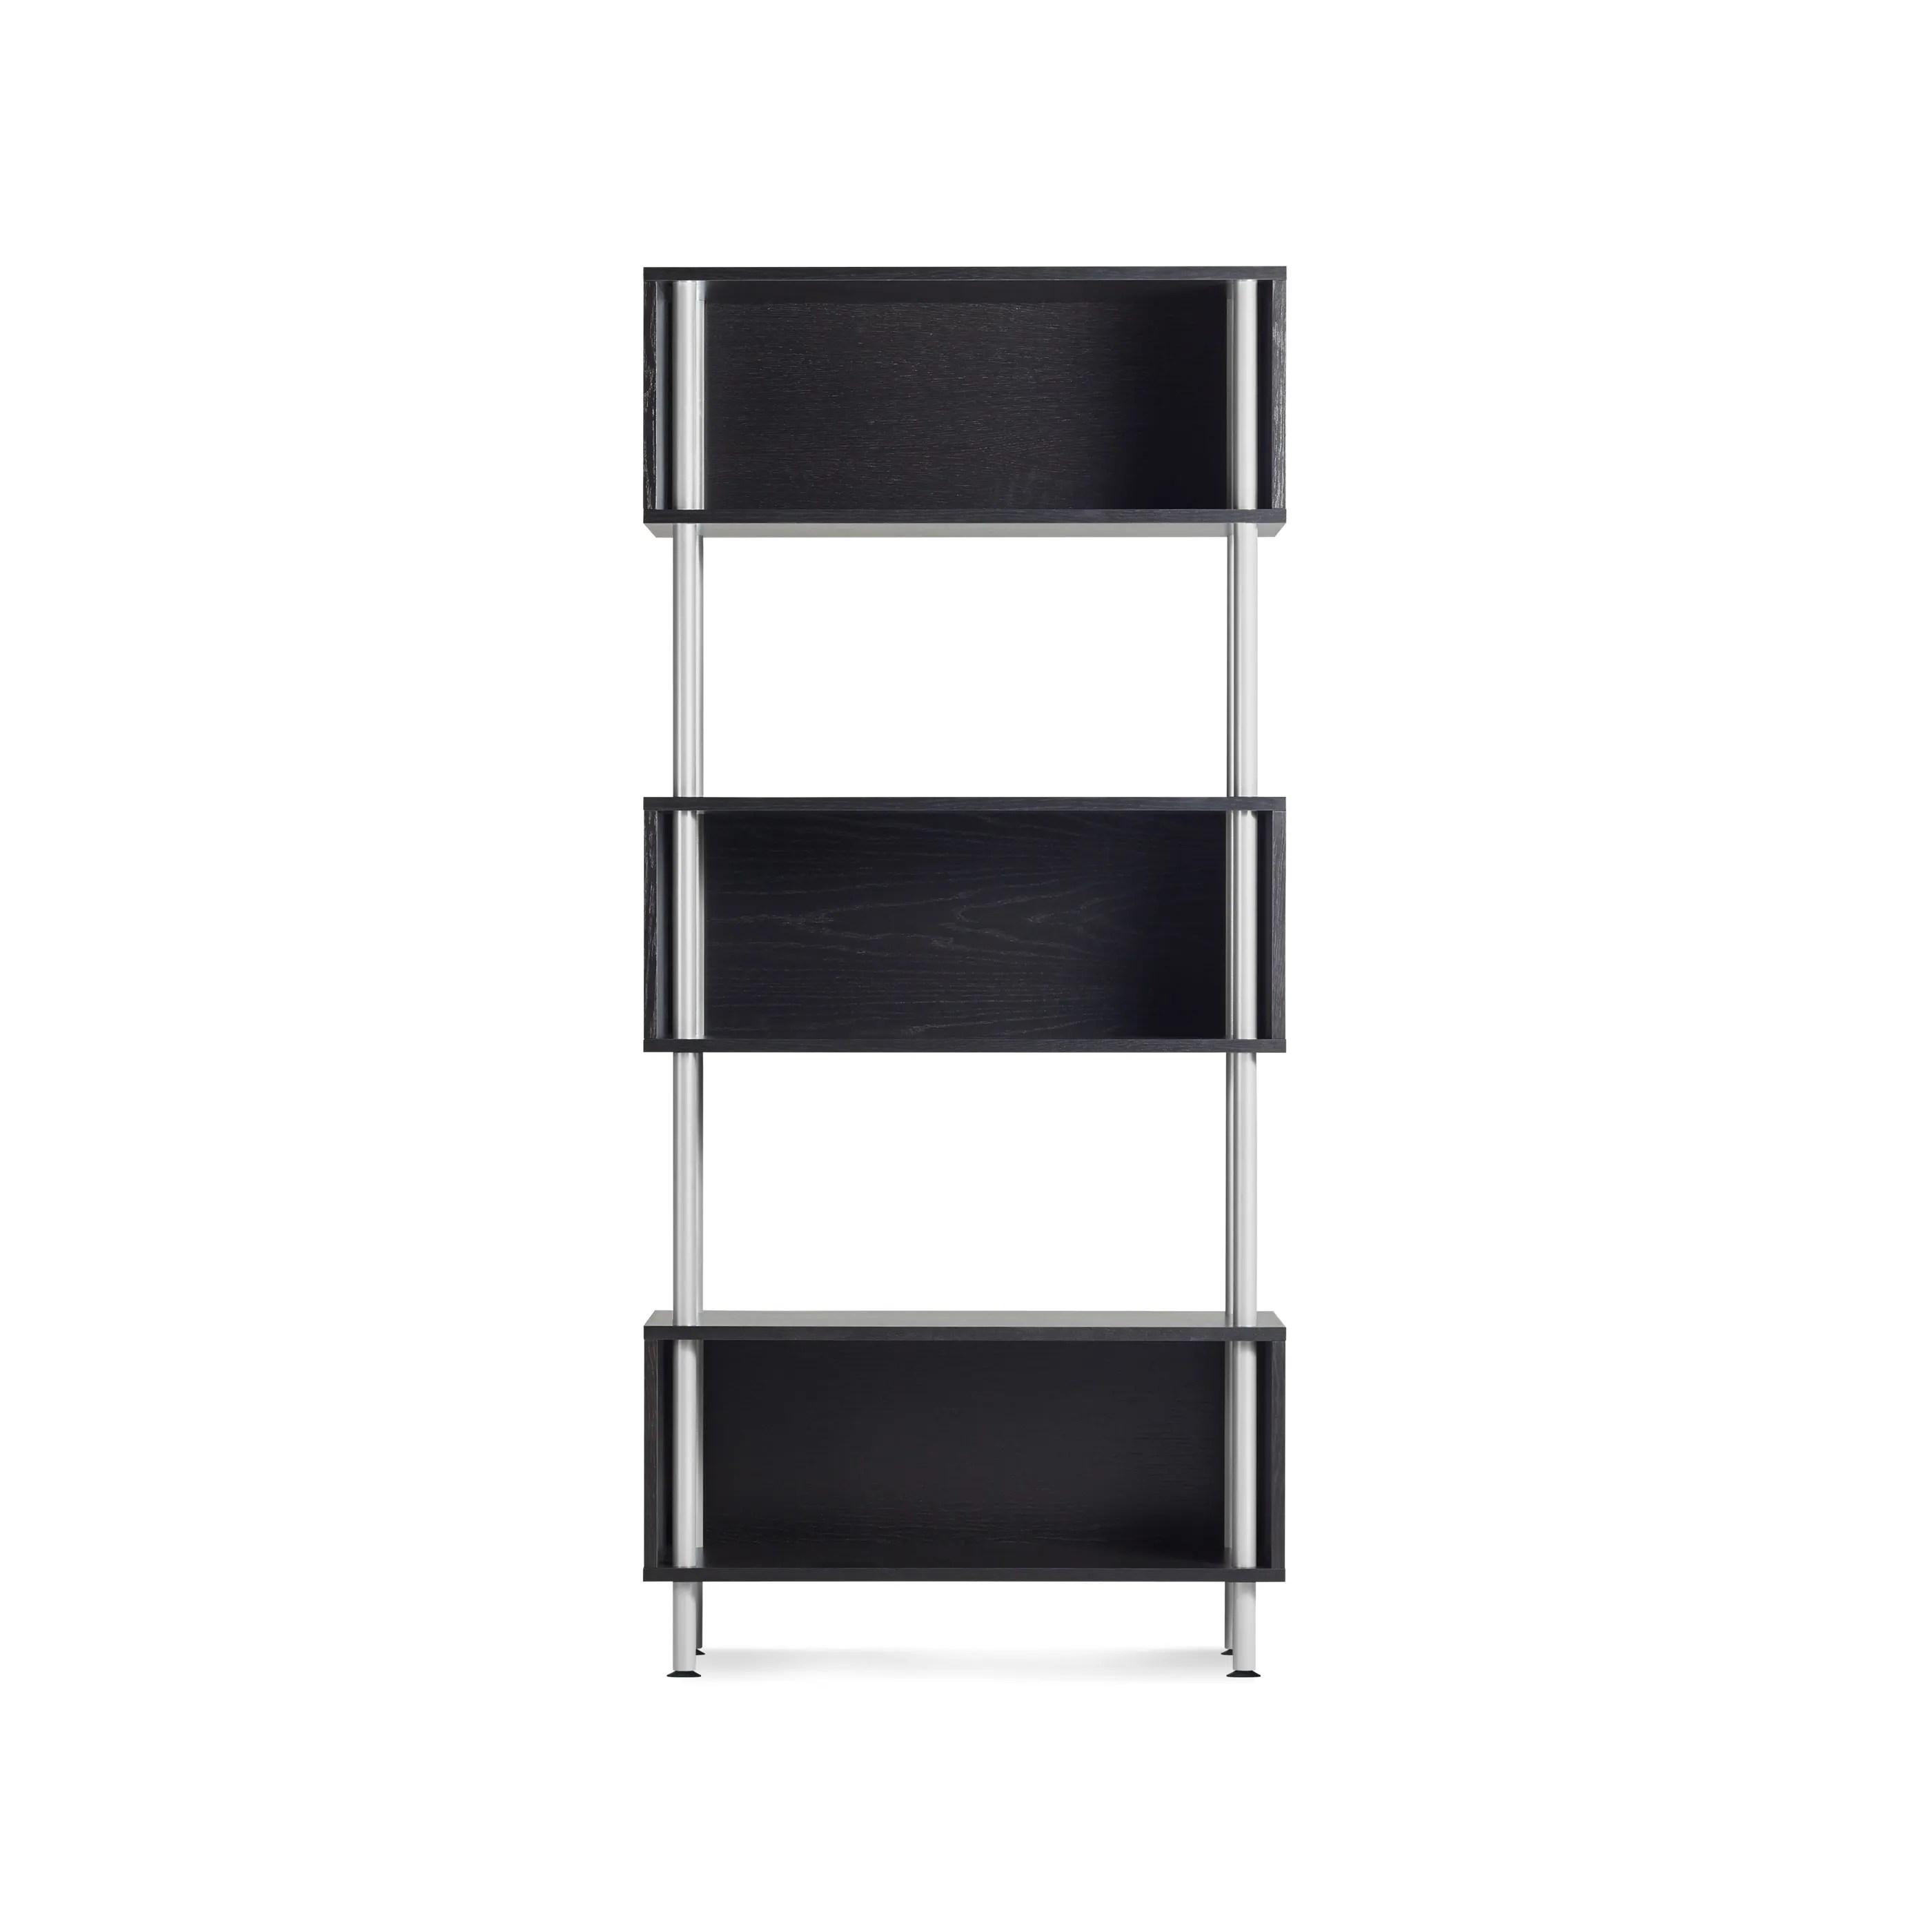 Compelling Ch1 3bxkit Go Ago 3 Box Graphite On Oak 1 2 1 Closed Shelving Units furniture Closed Shelving Unit